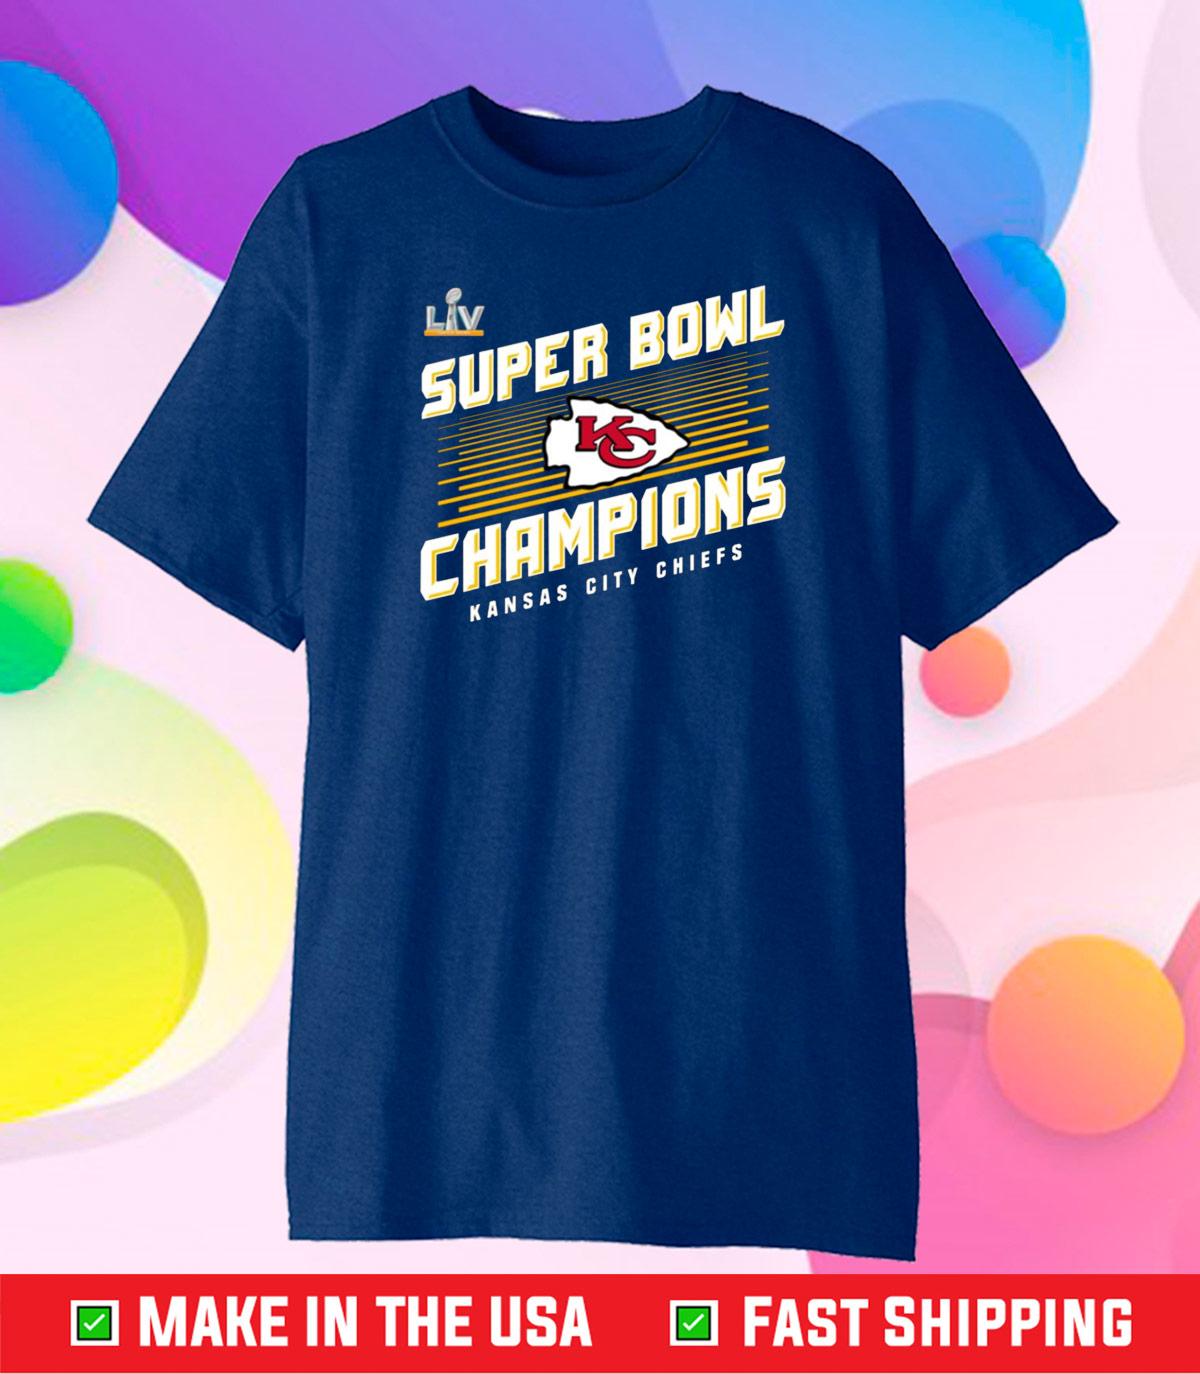 Kansas City Chiefs 2021 Super Bowl Championship Unisex T-Shirt